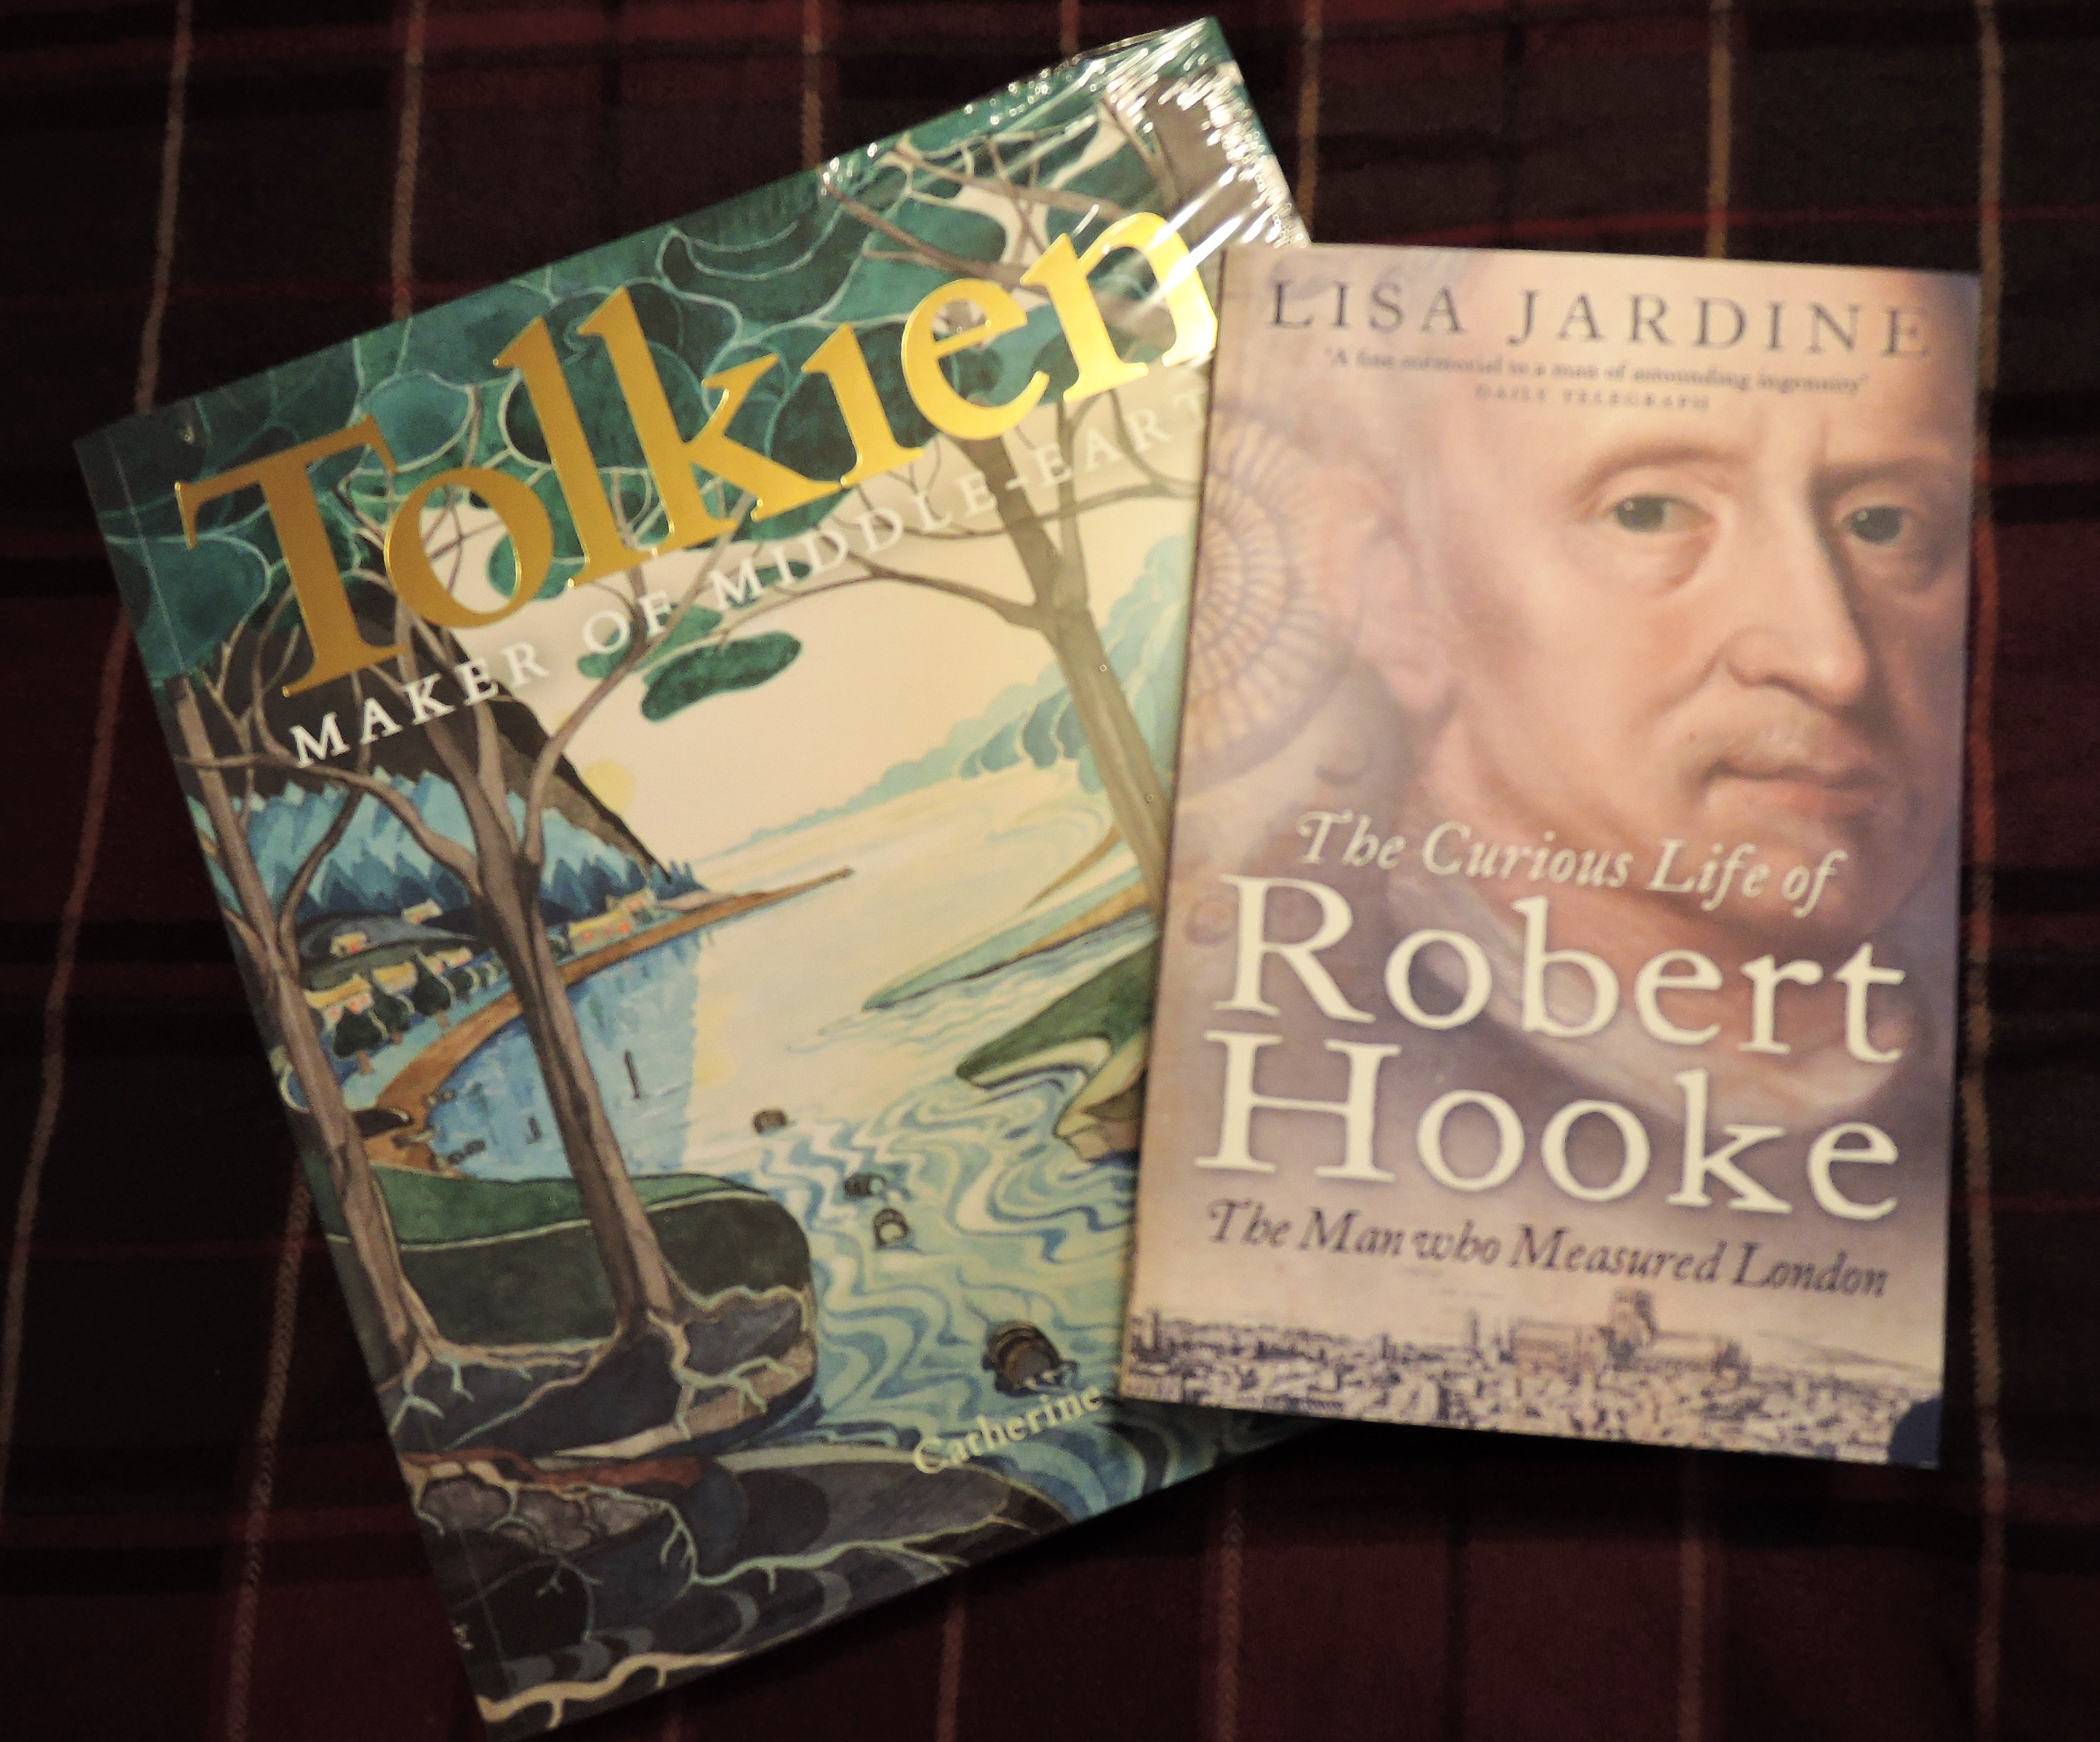 Books make great Christmas presents